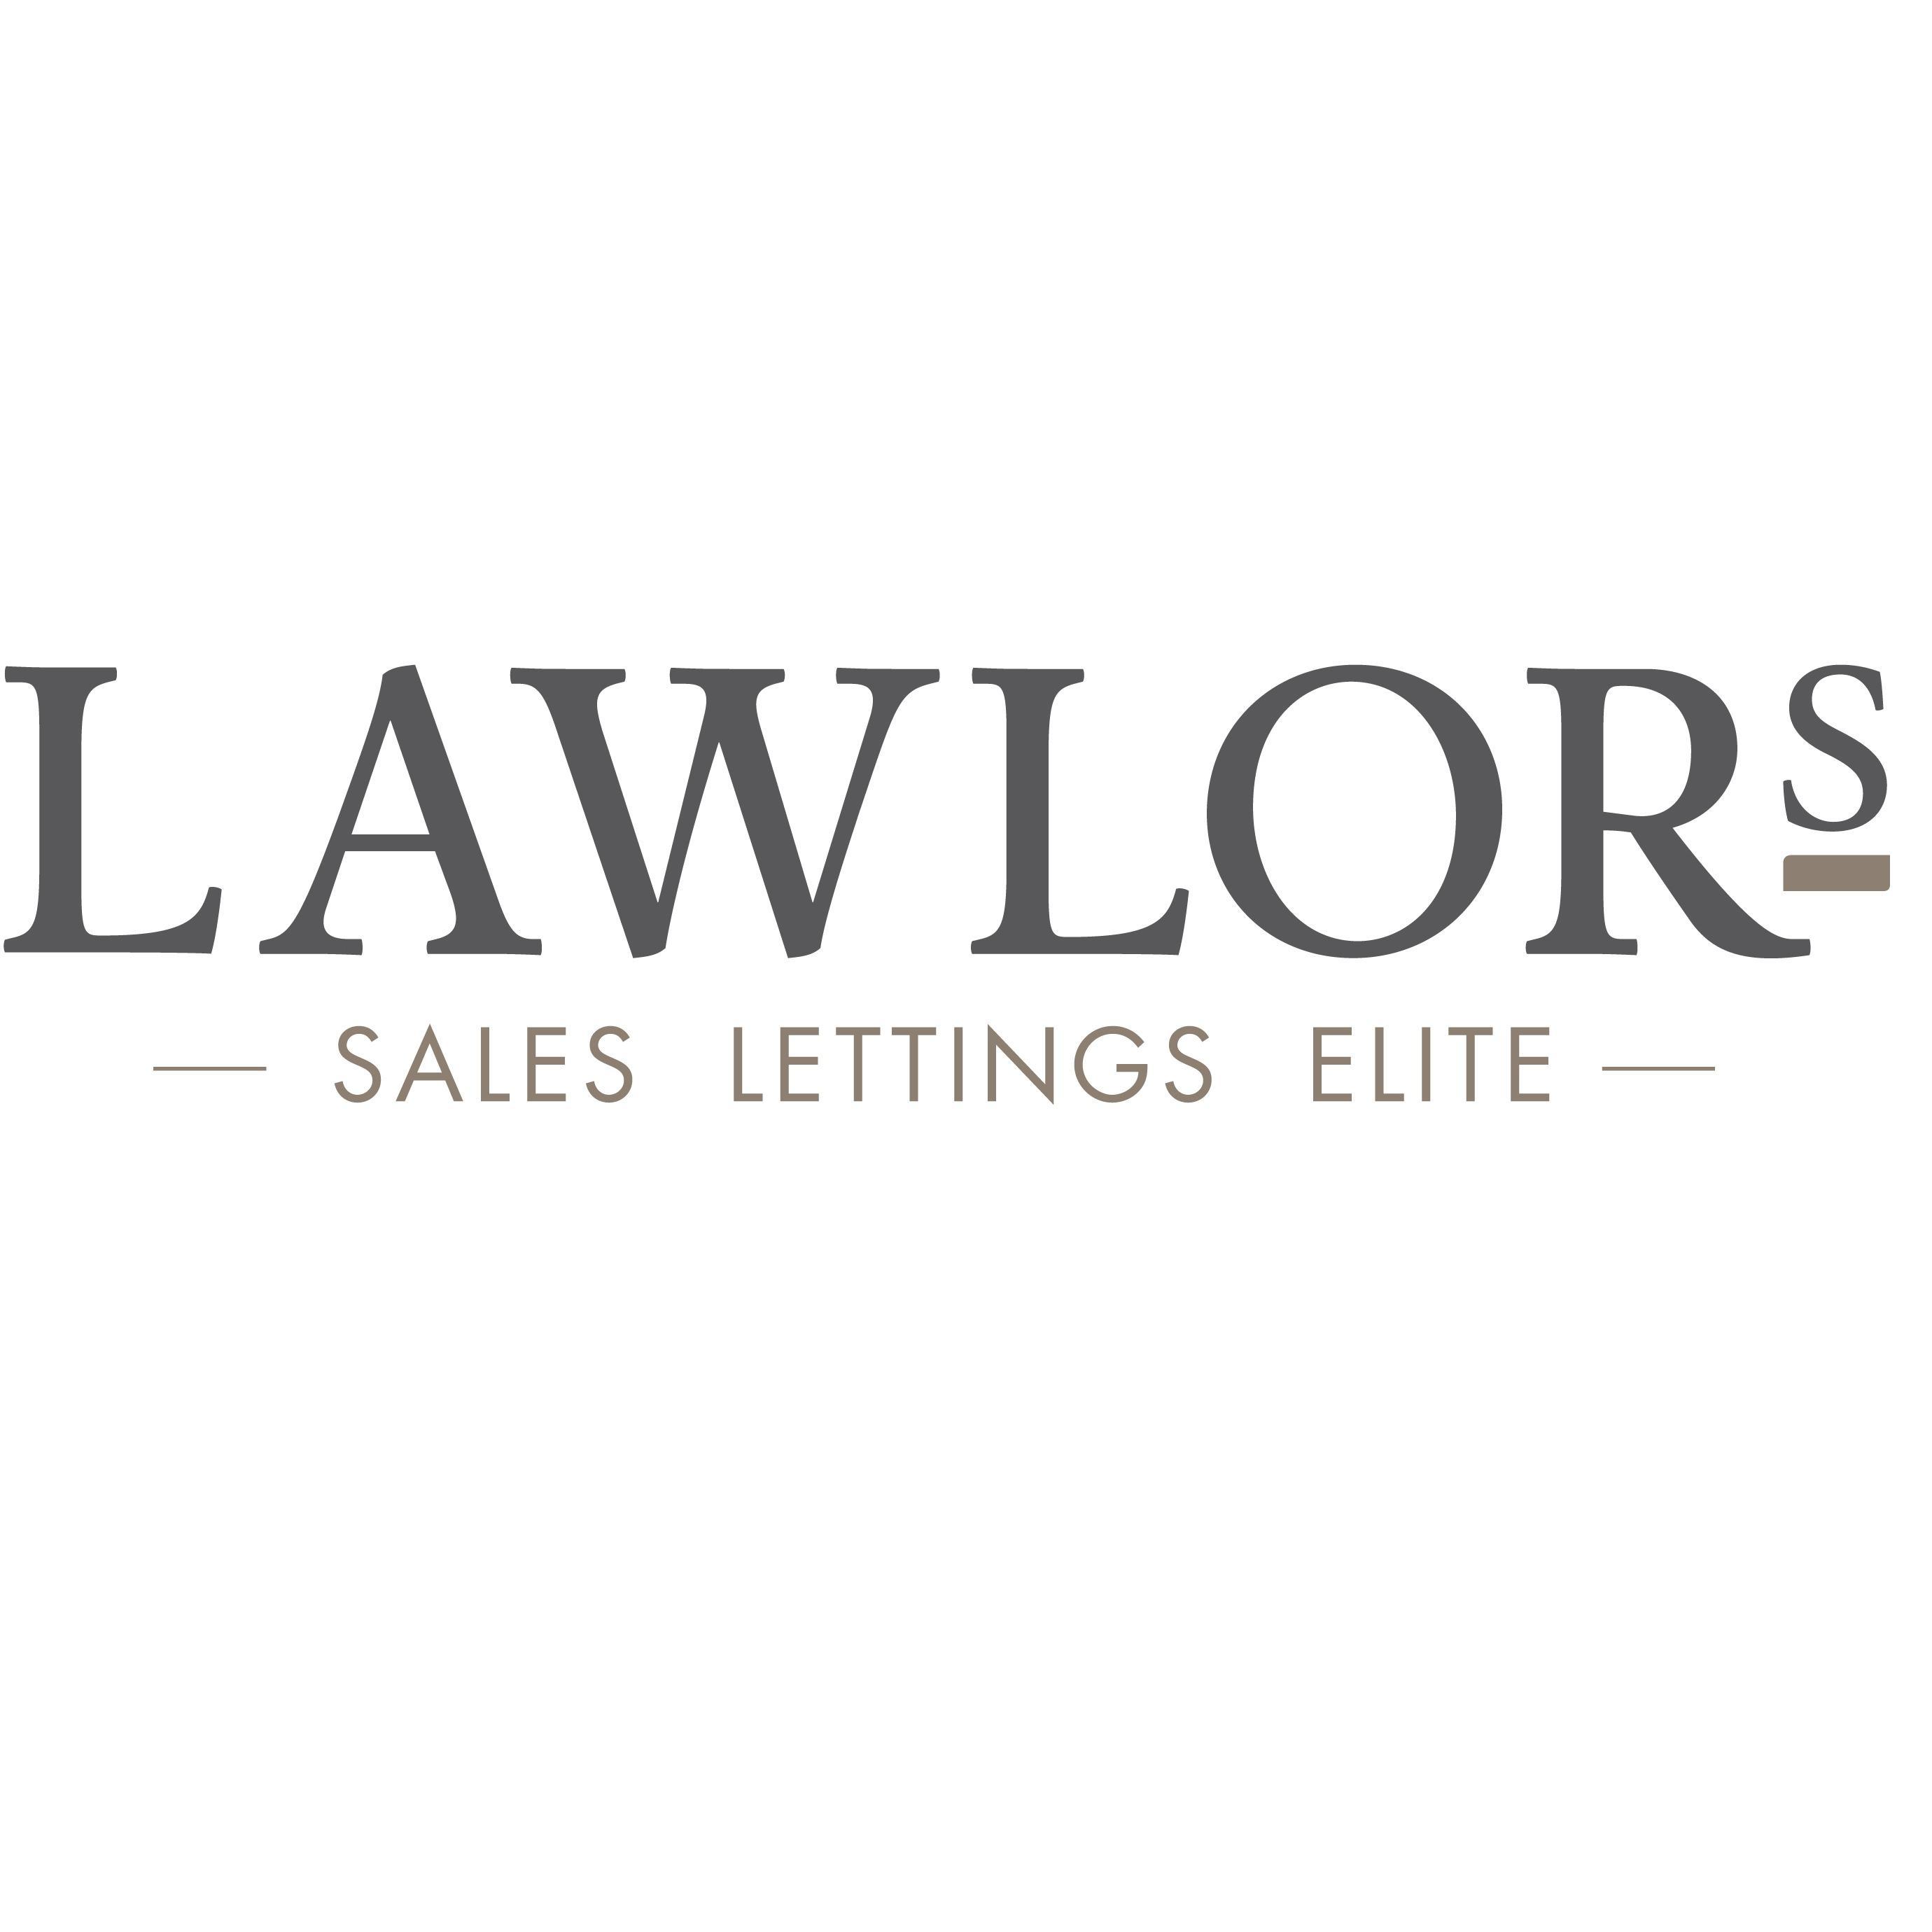 Lawlors Estate Agents Loughton - Loughton, Essex IG10 4HJ - 020 8502 5588 | ShowMeLocal.com